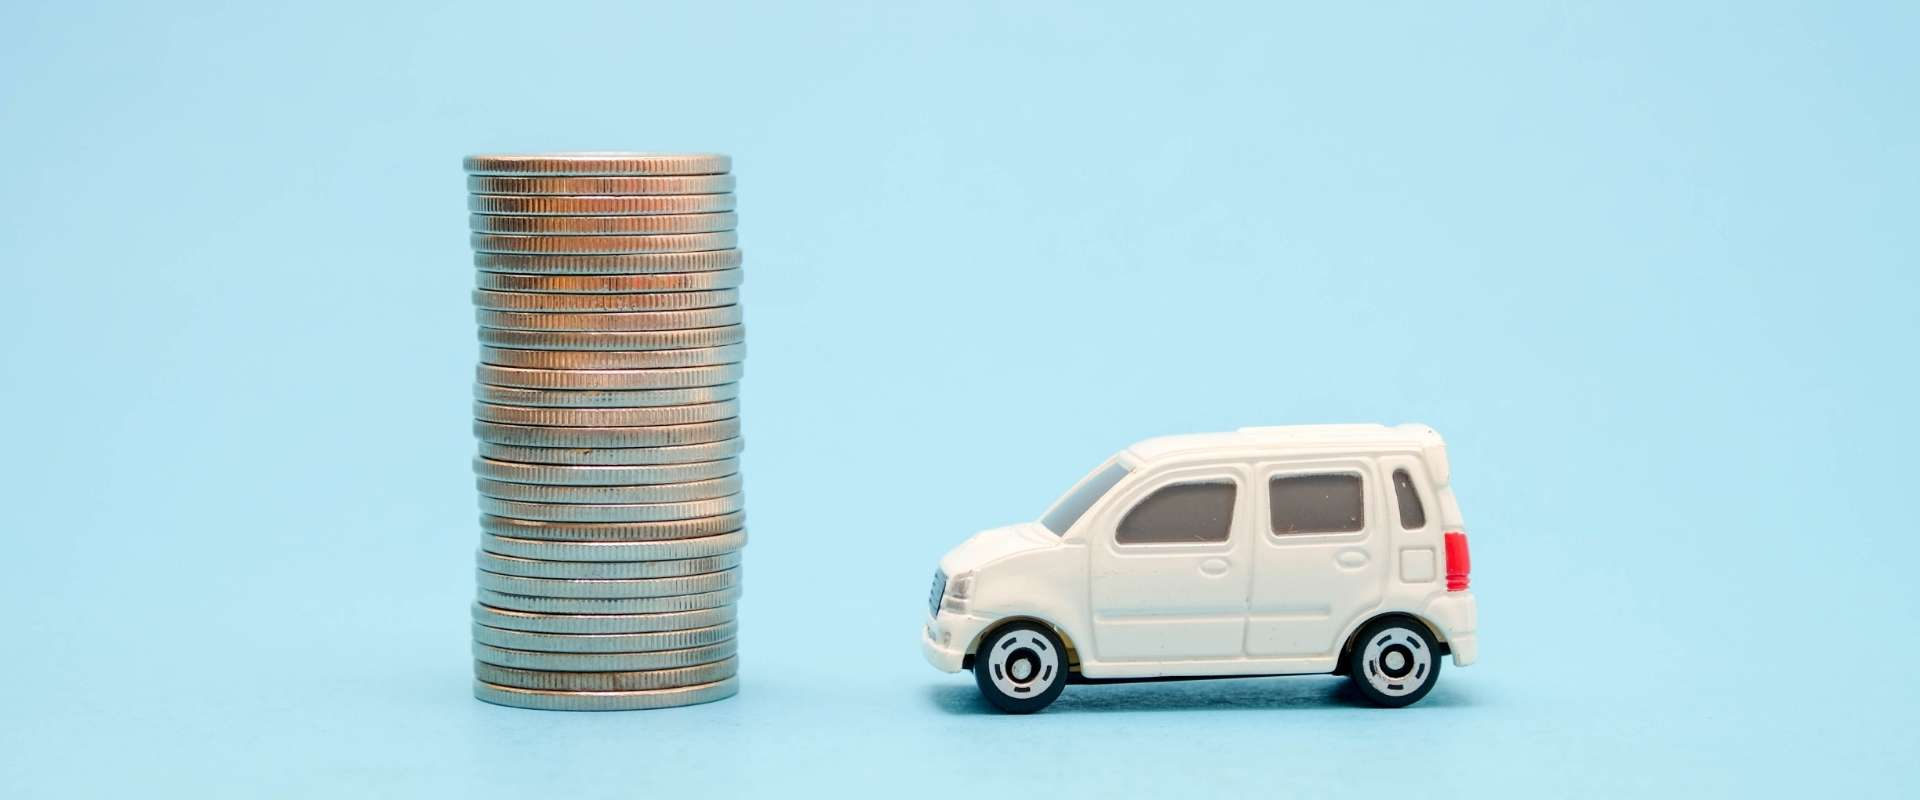 Afectados por usura en financiación de vehículos